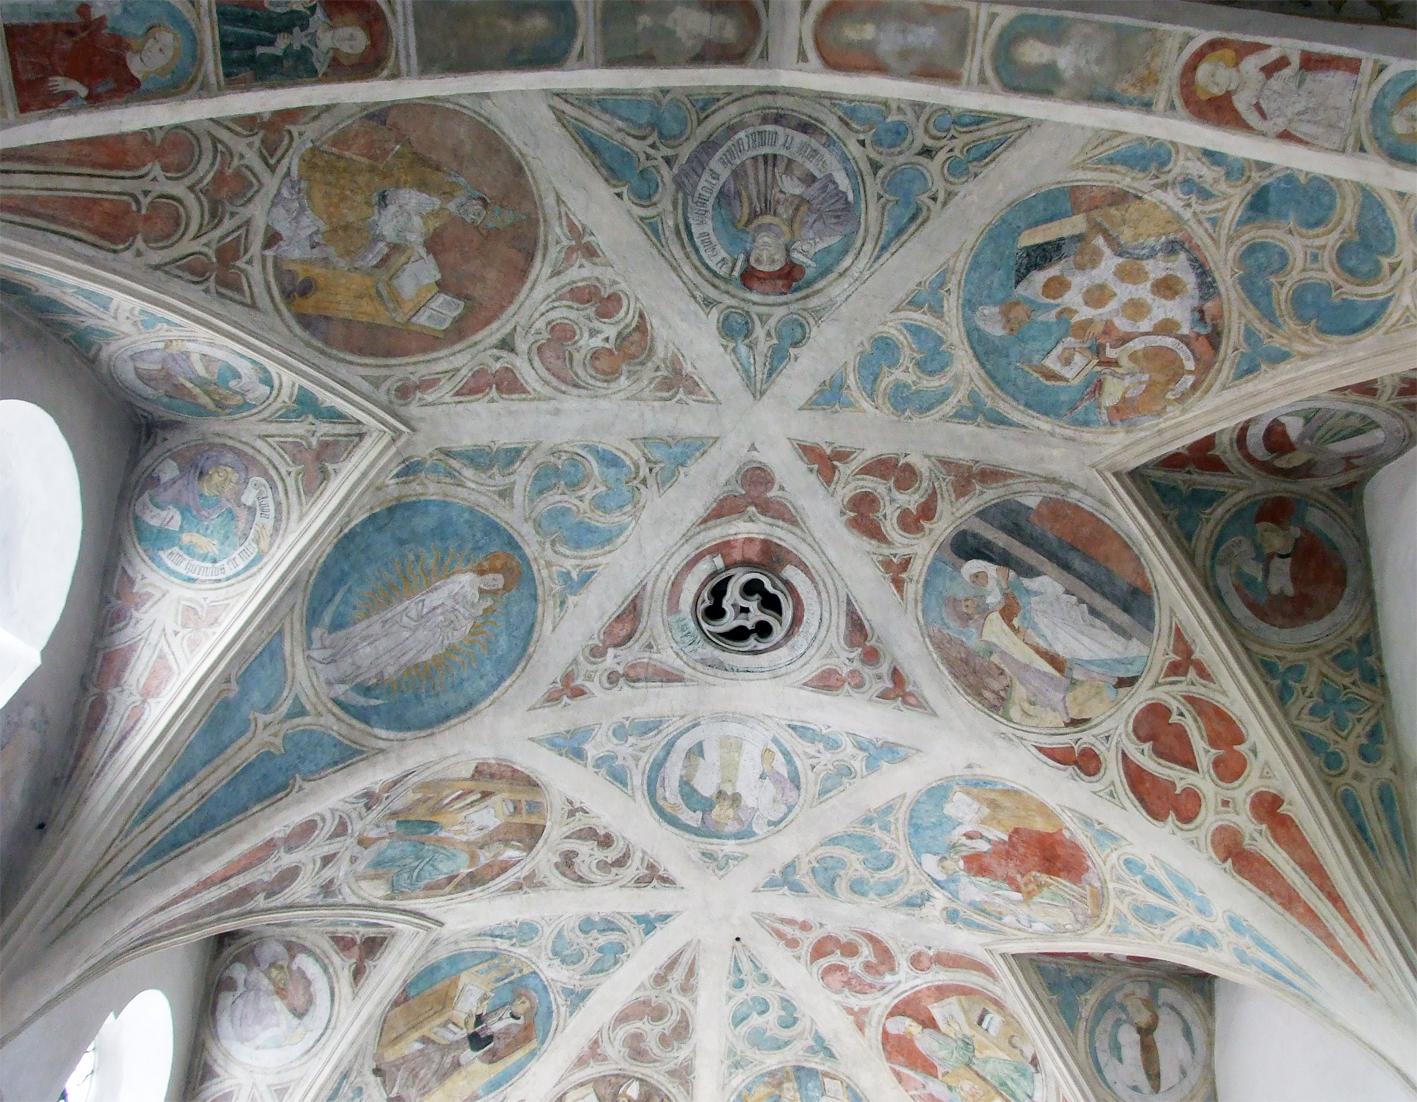 2021 05 17 aoelfb niedergottsau kirche mariae himmelfahrt fresken im presbyterium